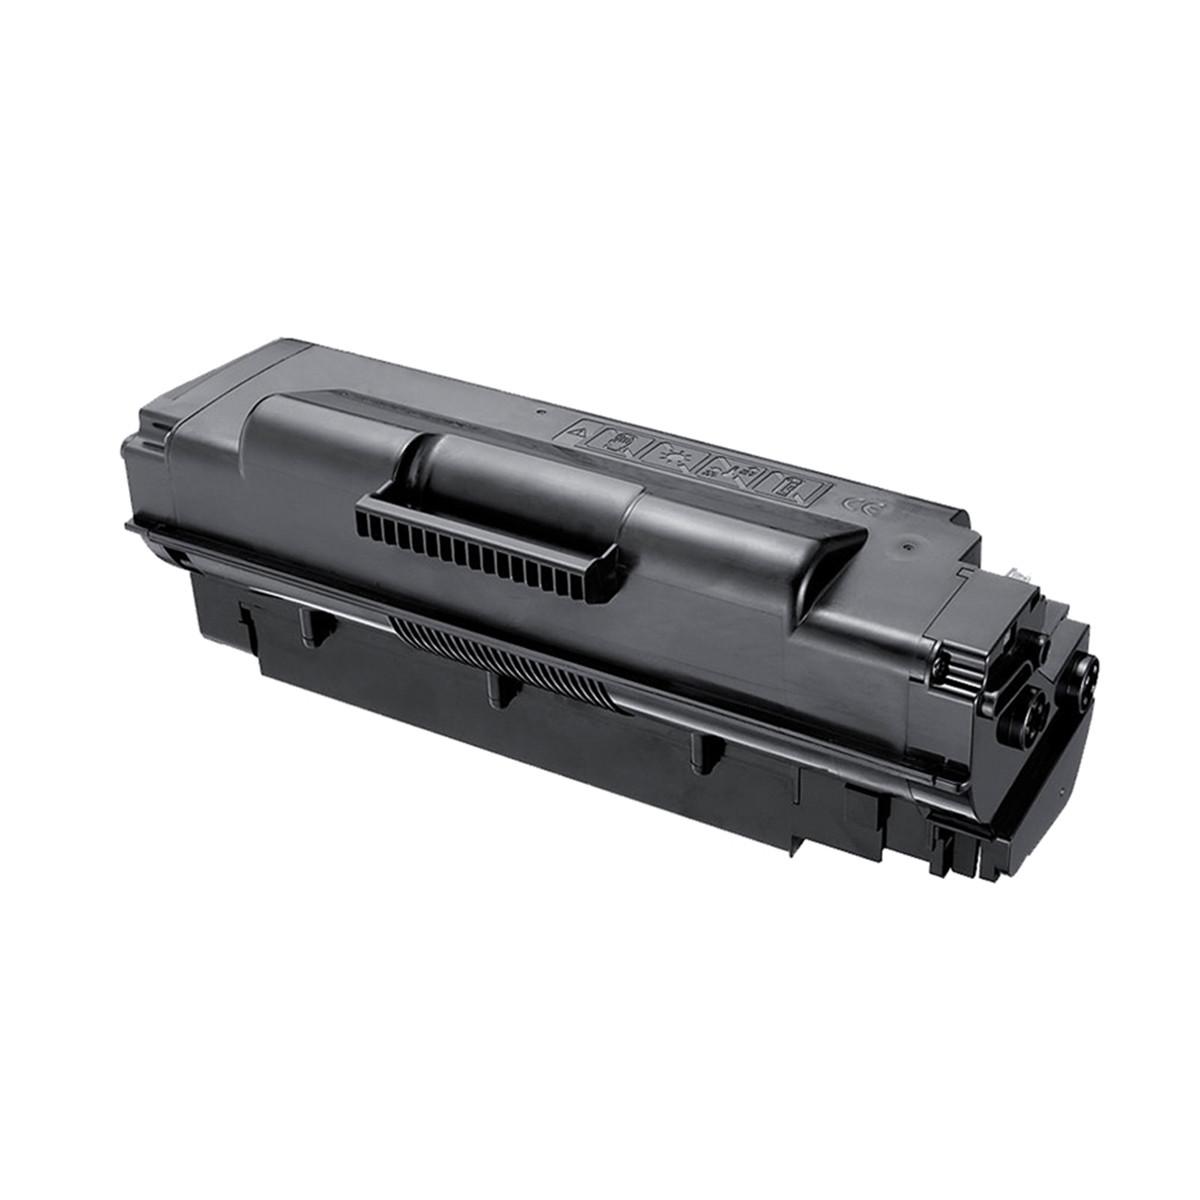 Toner Compatível Samsung D307L   ML5010 ML4510 ML4512 ML5012 ML5015 ML5017   Premium Quality 5k